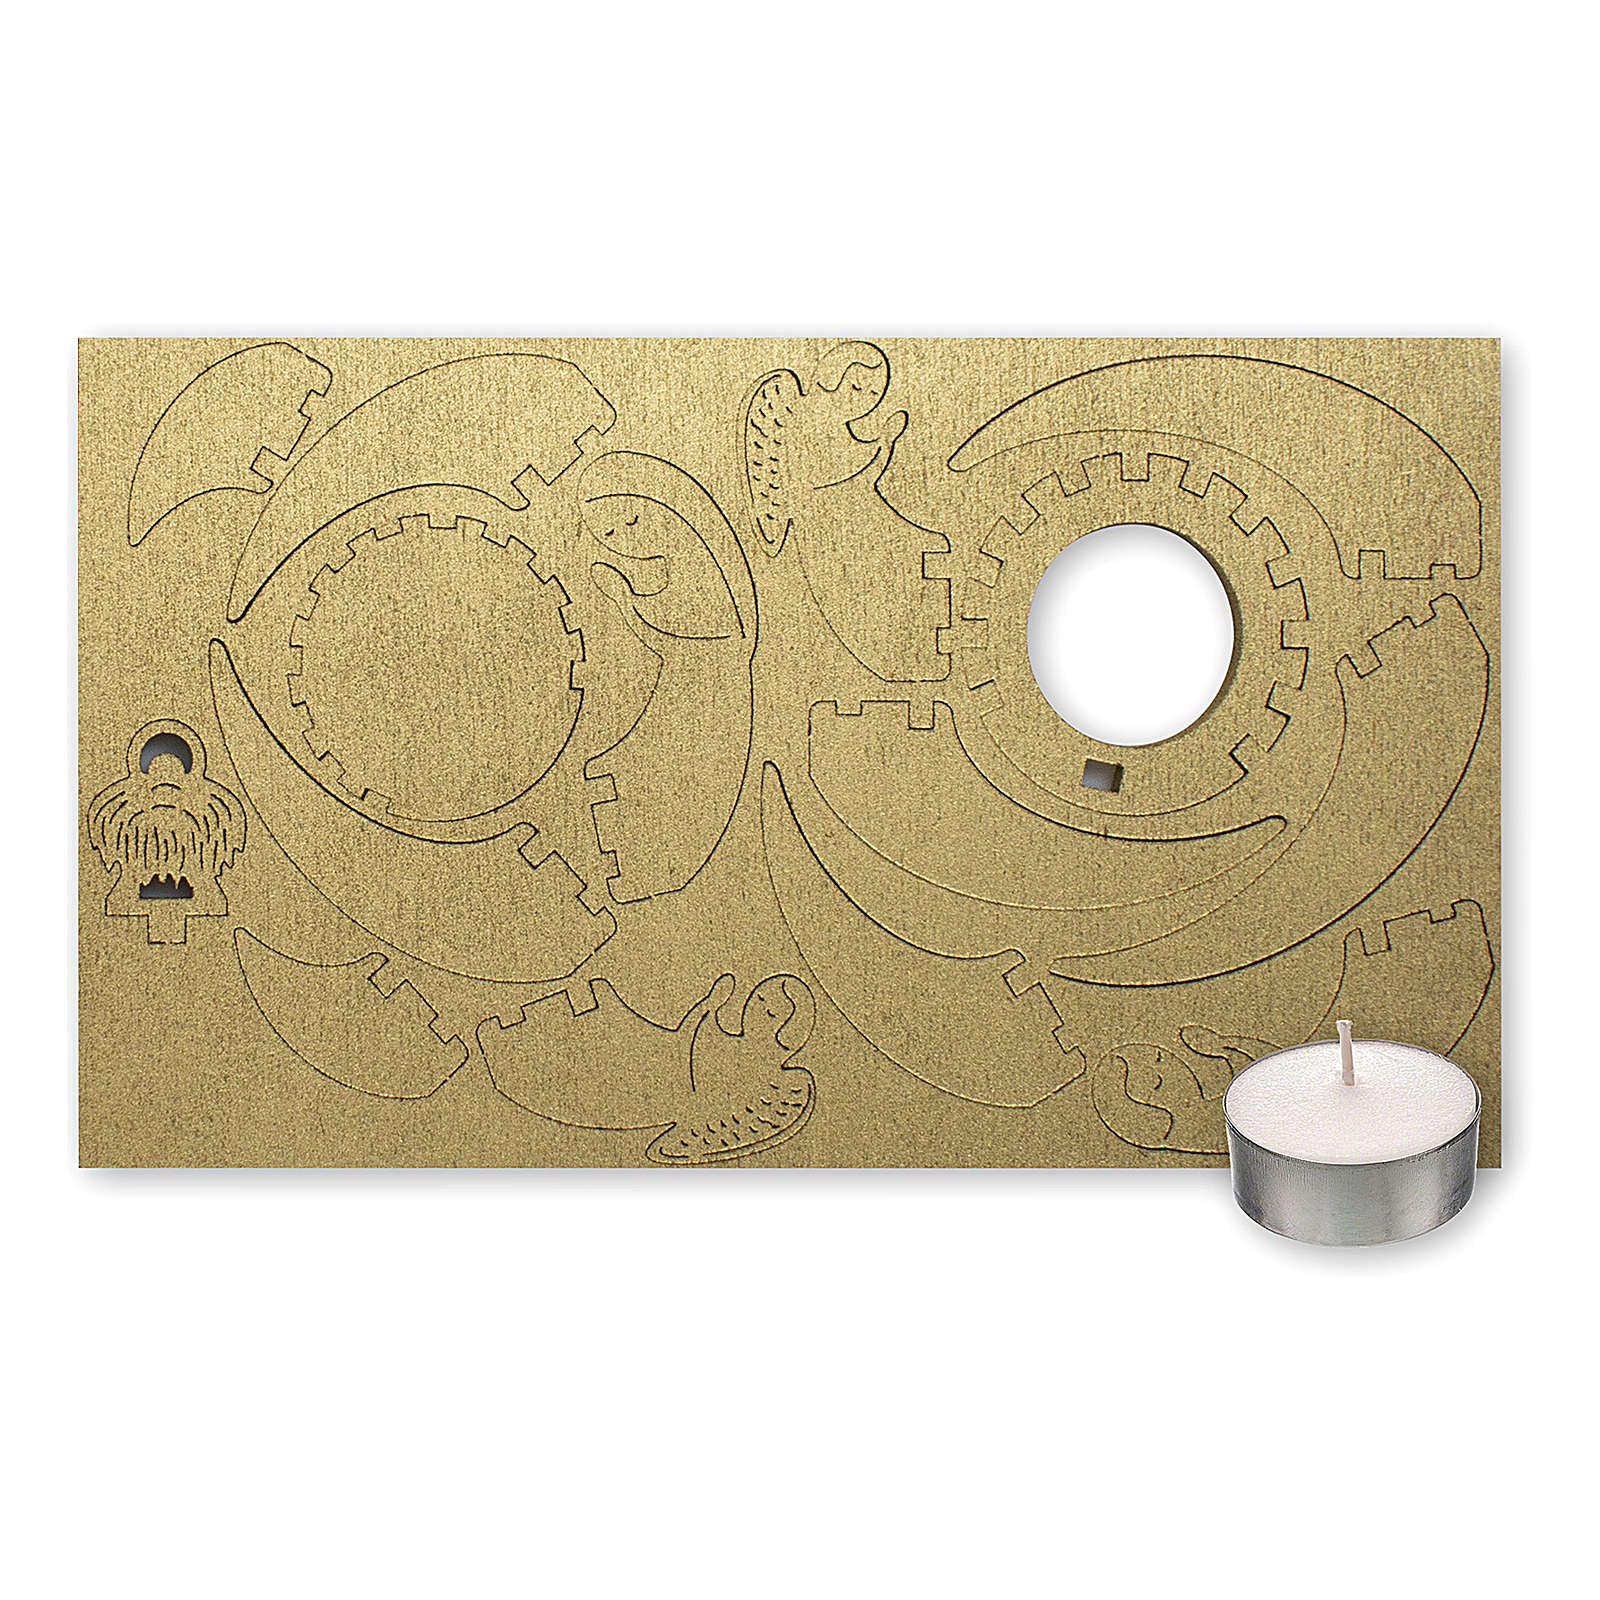 Candelero de madera dorada imagen Belén 3